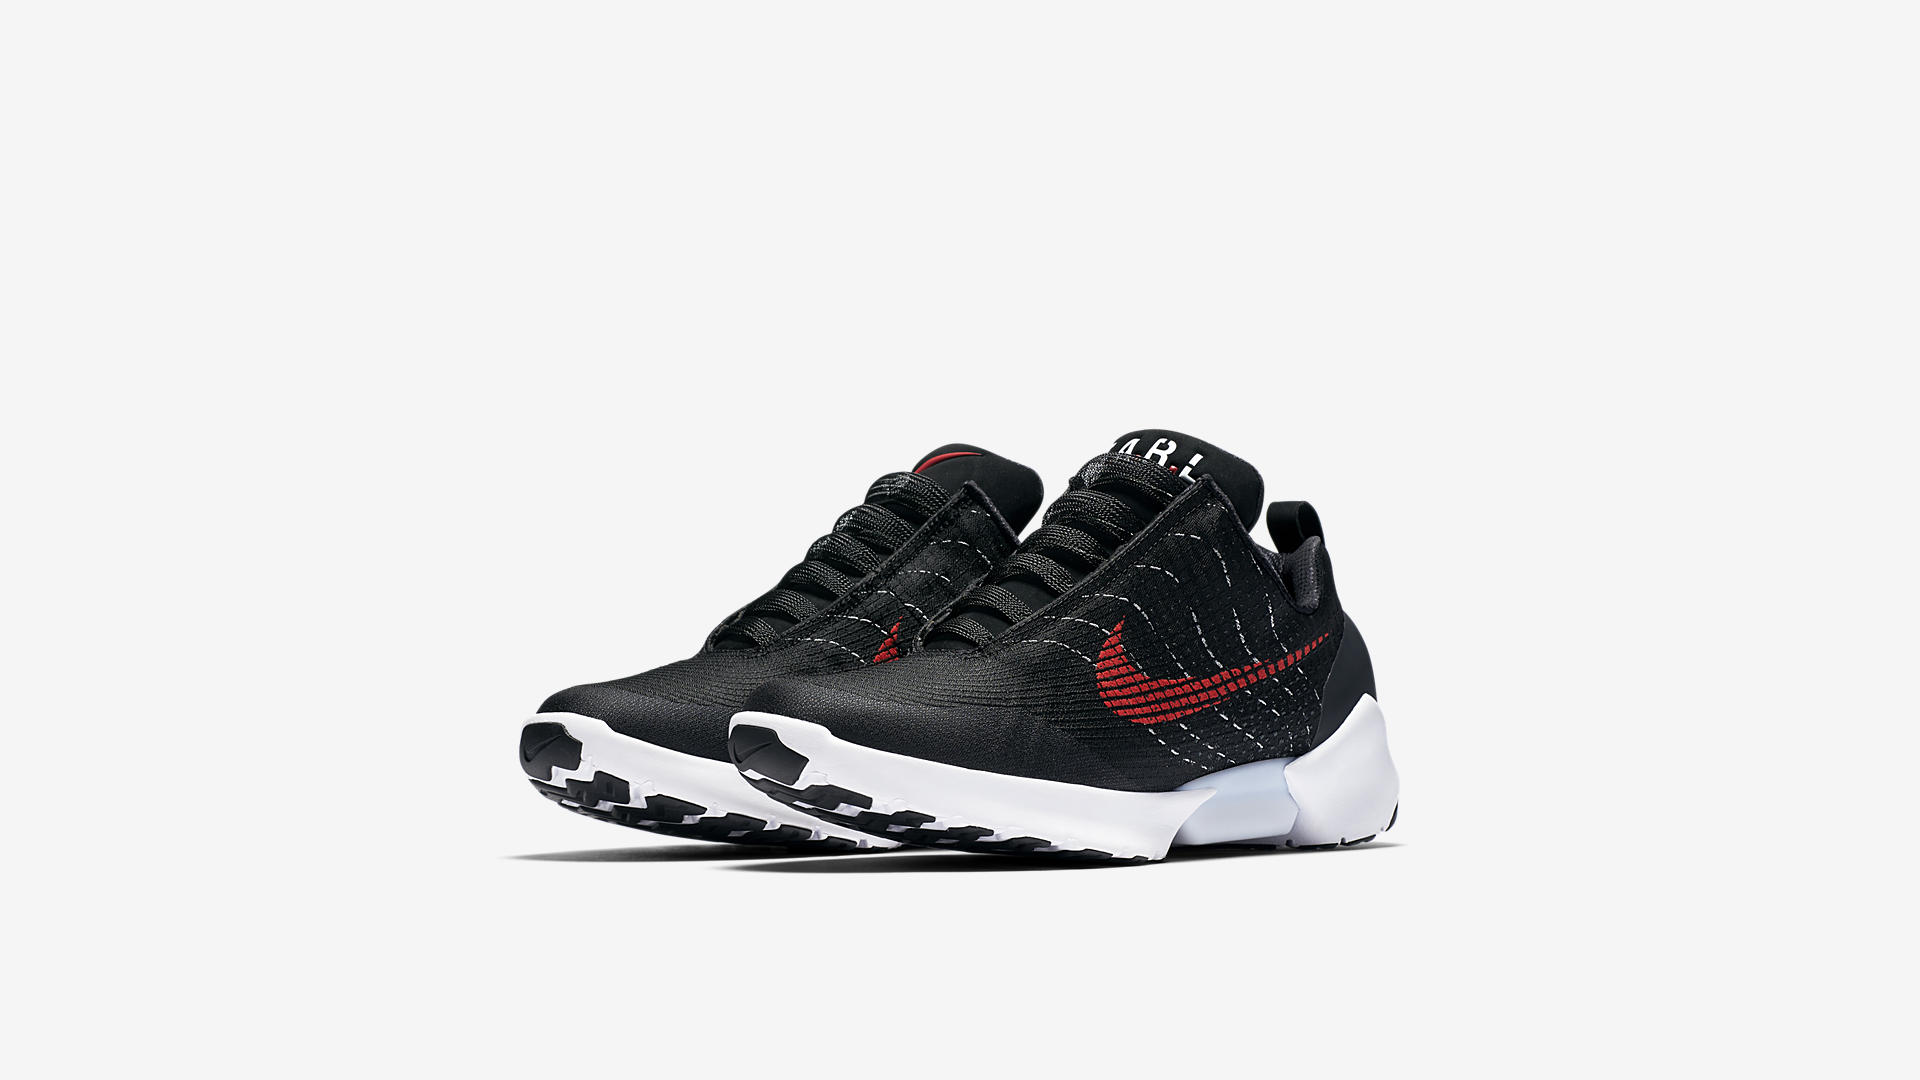 843871 005 Nike HyperAdapt 1.0 University Red 5